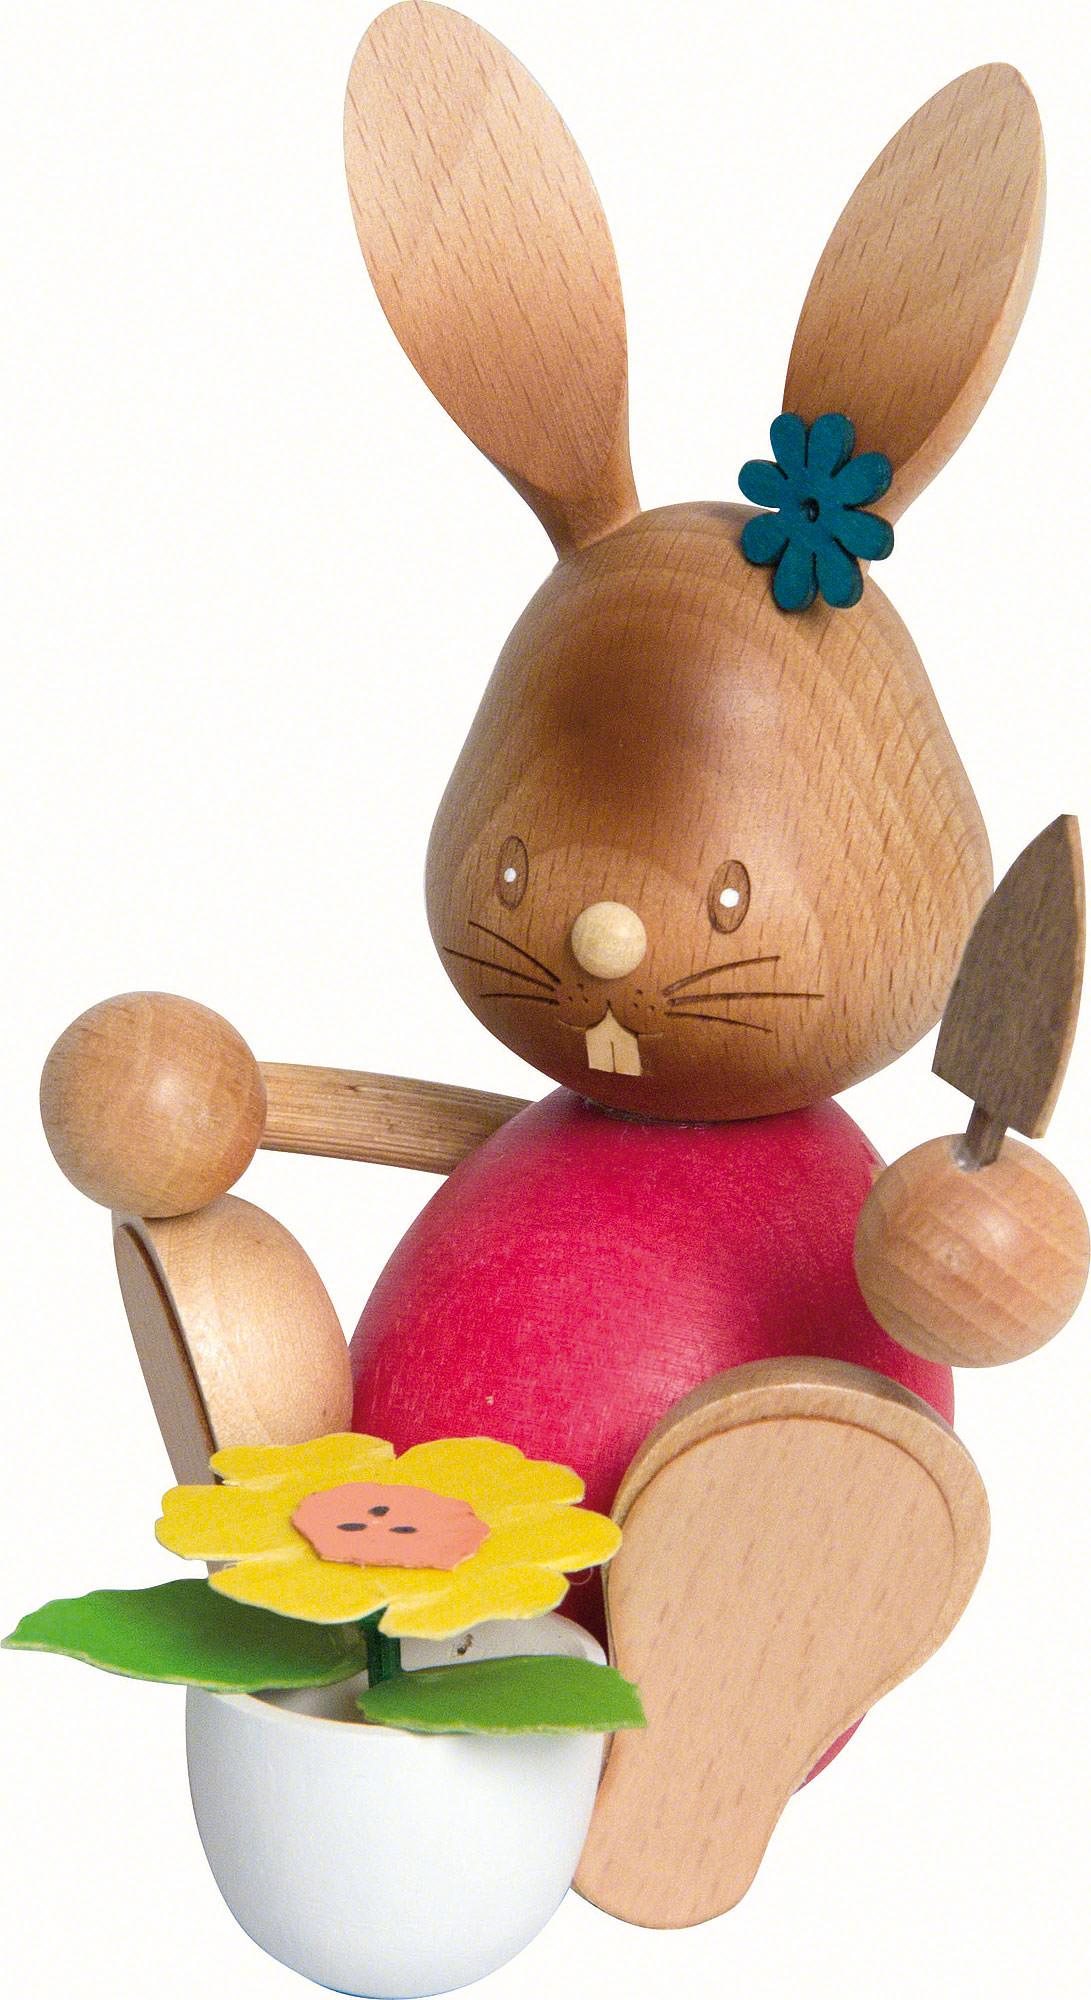 Snubby Bunny gardener (12cm/4.7in)ch by Drechslerei Kuhnert.